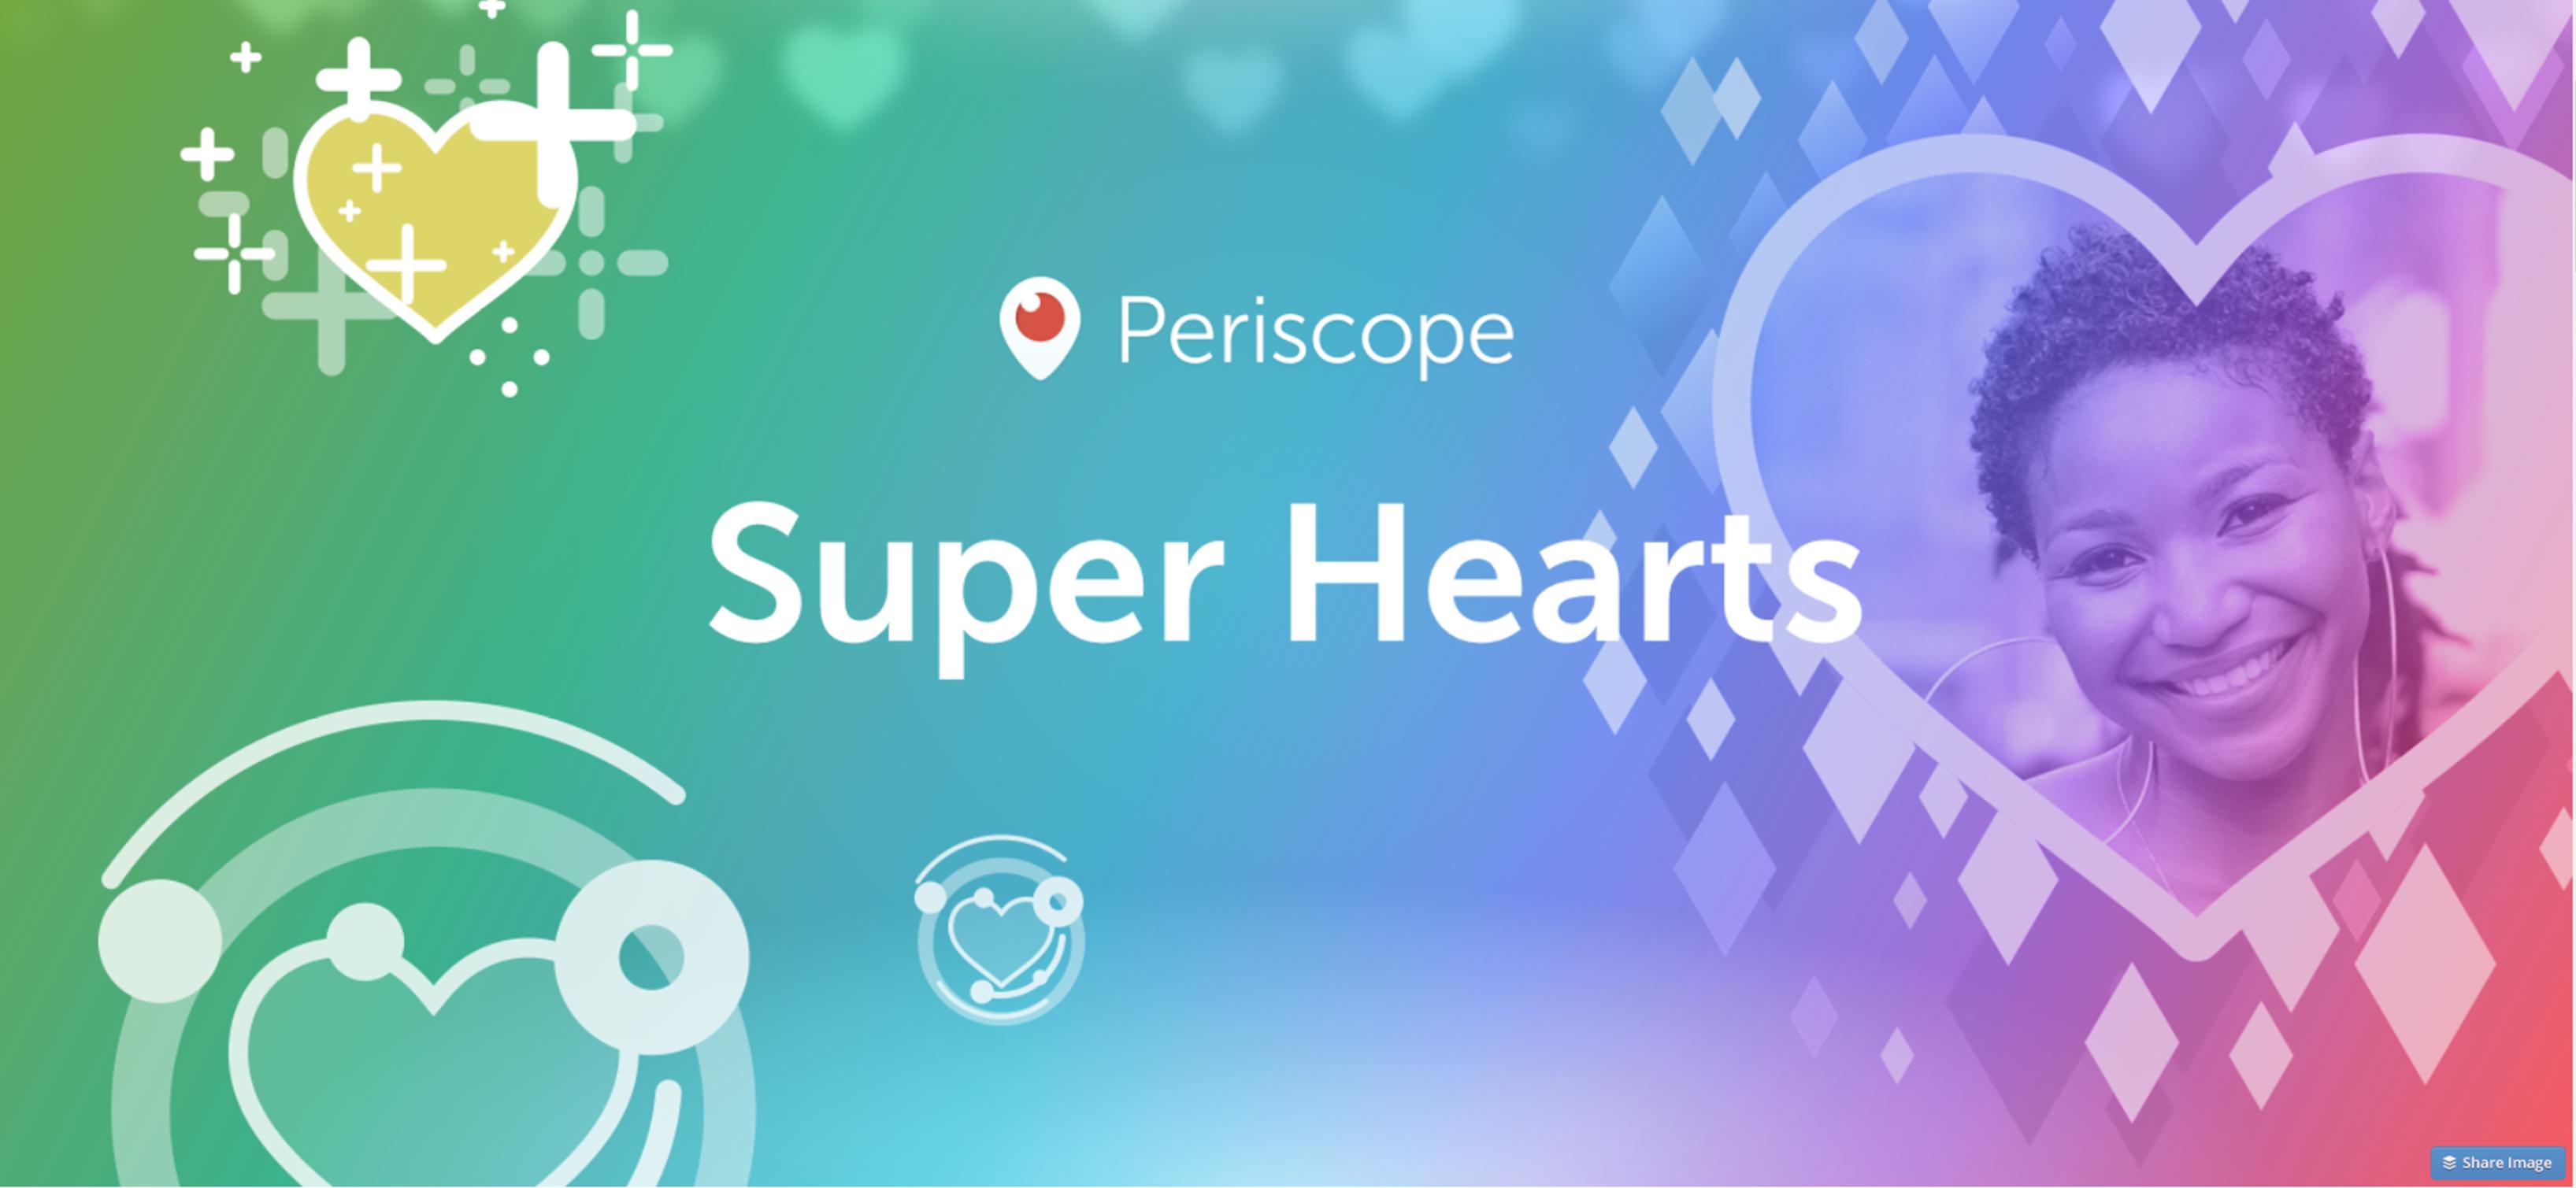 Periscope Super Hearts Logo on Vicki Fitch.com